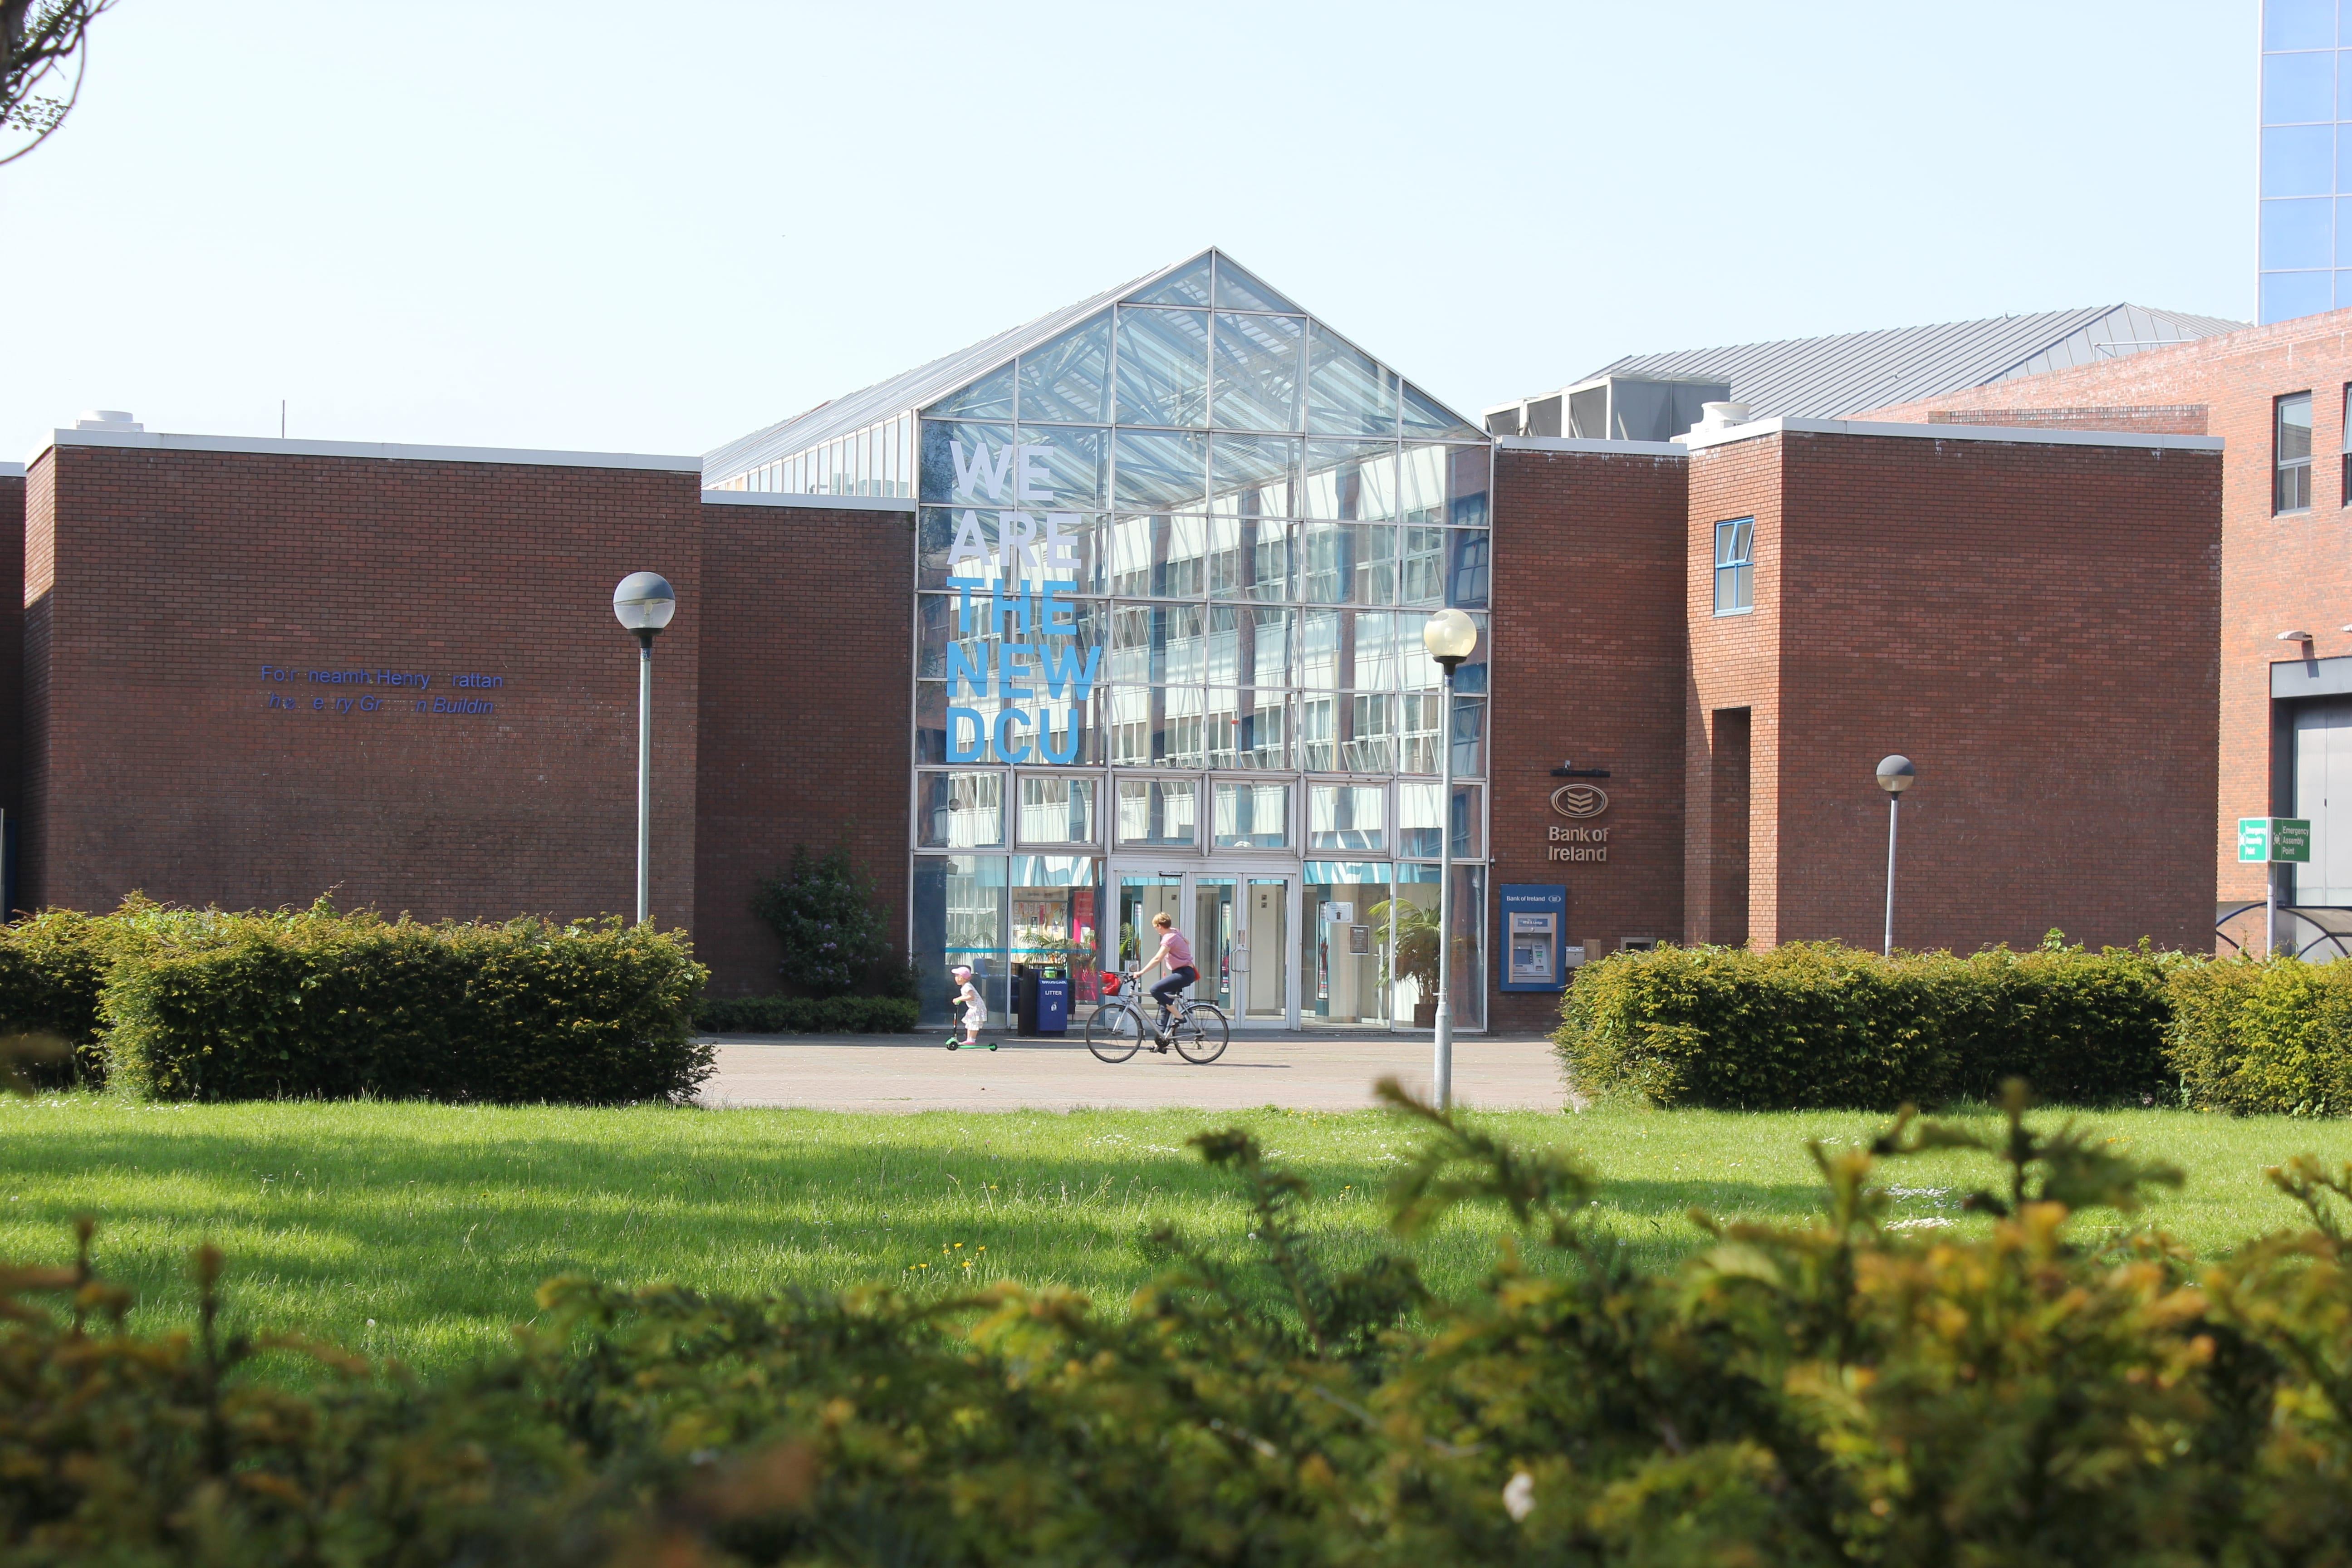 Dublin City University - campus photos - the new dcu